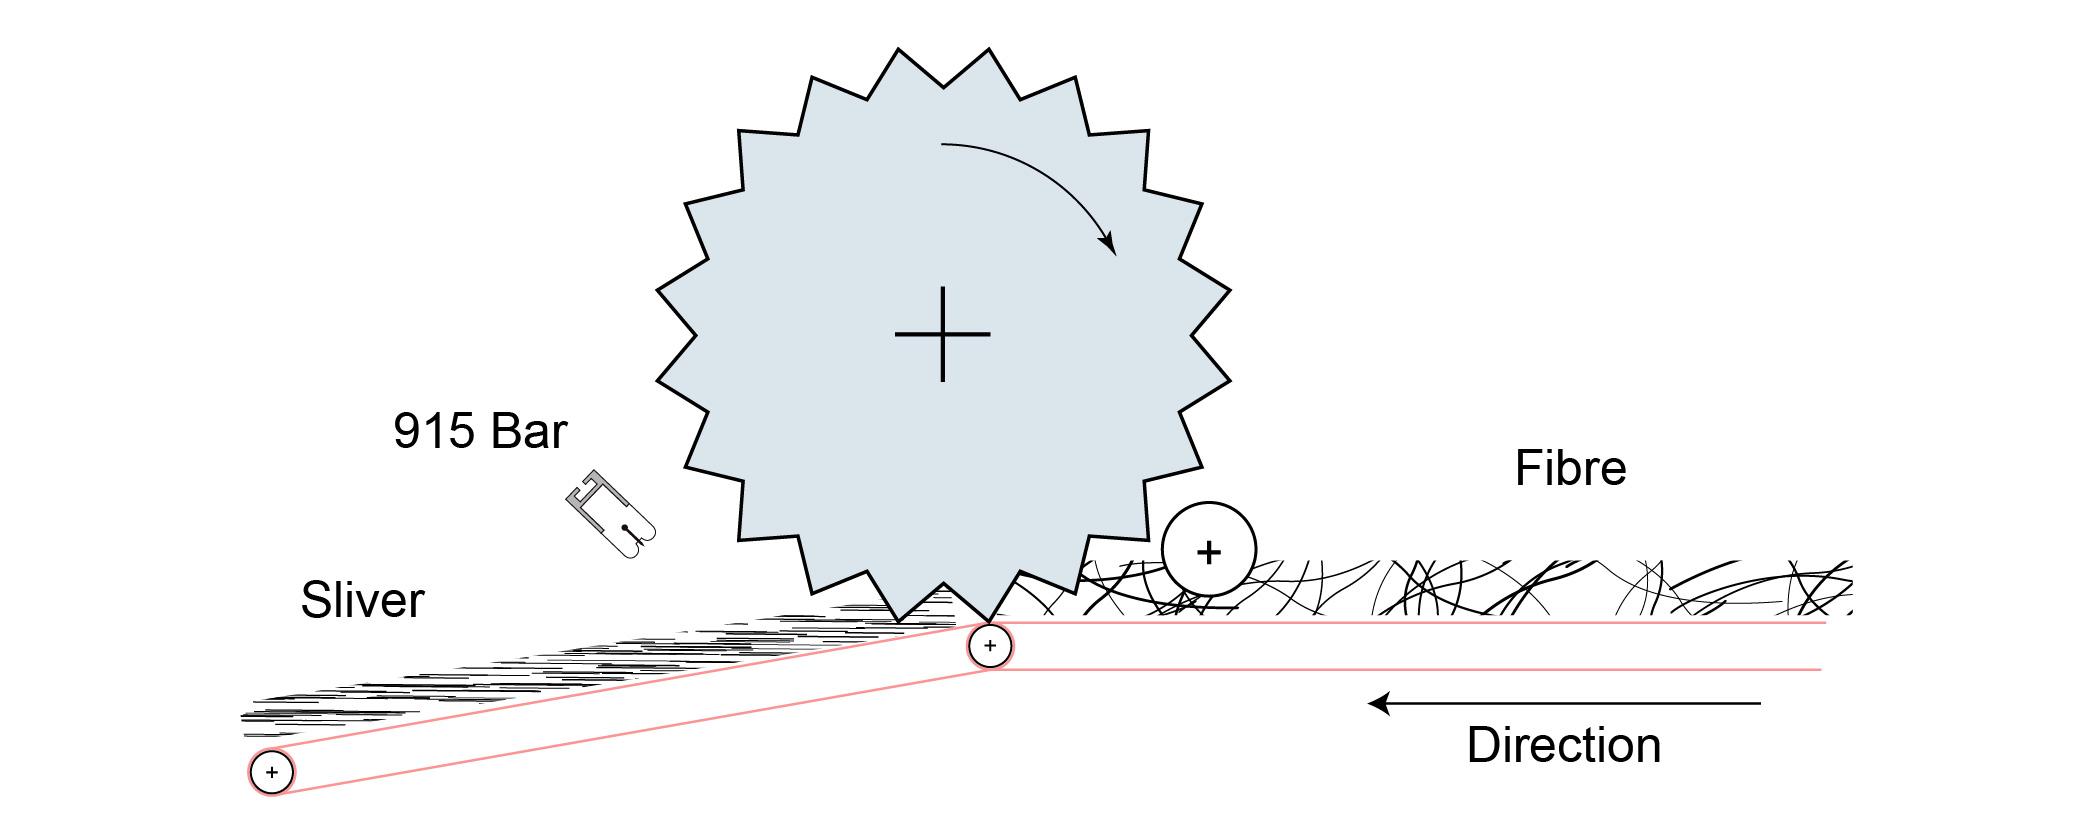 Prevenir que las fibras se peguen a peines en máquinas de cardado textil